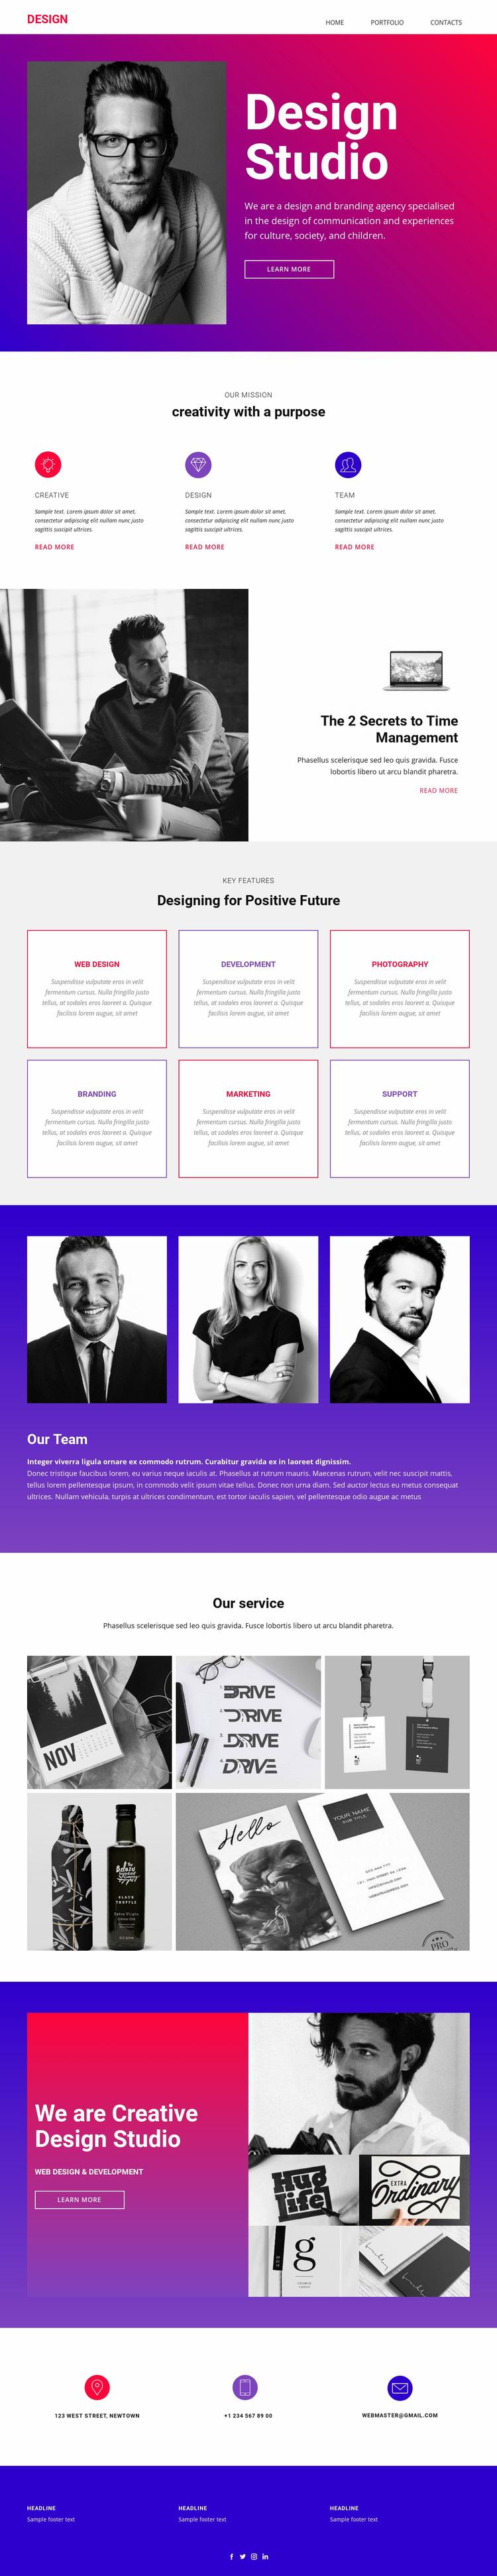 Fully integrated studio Web Page Designer